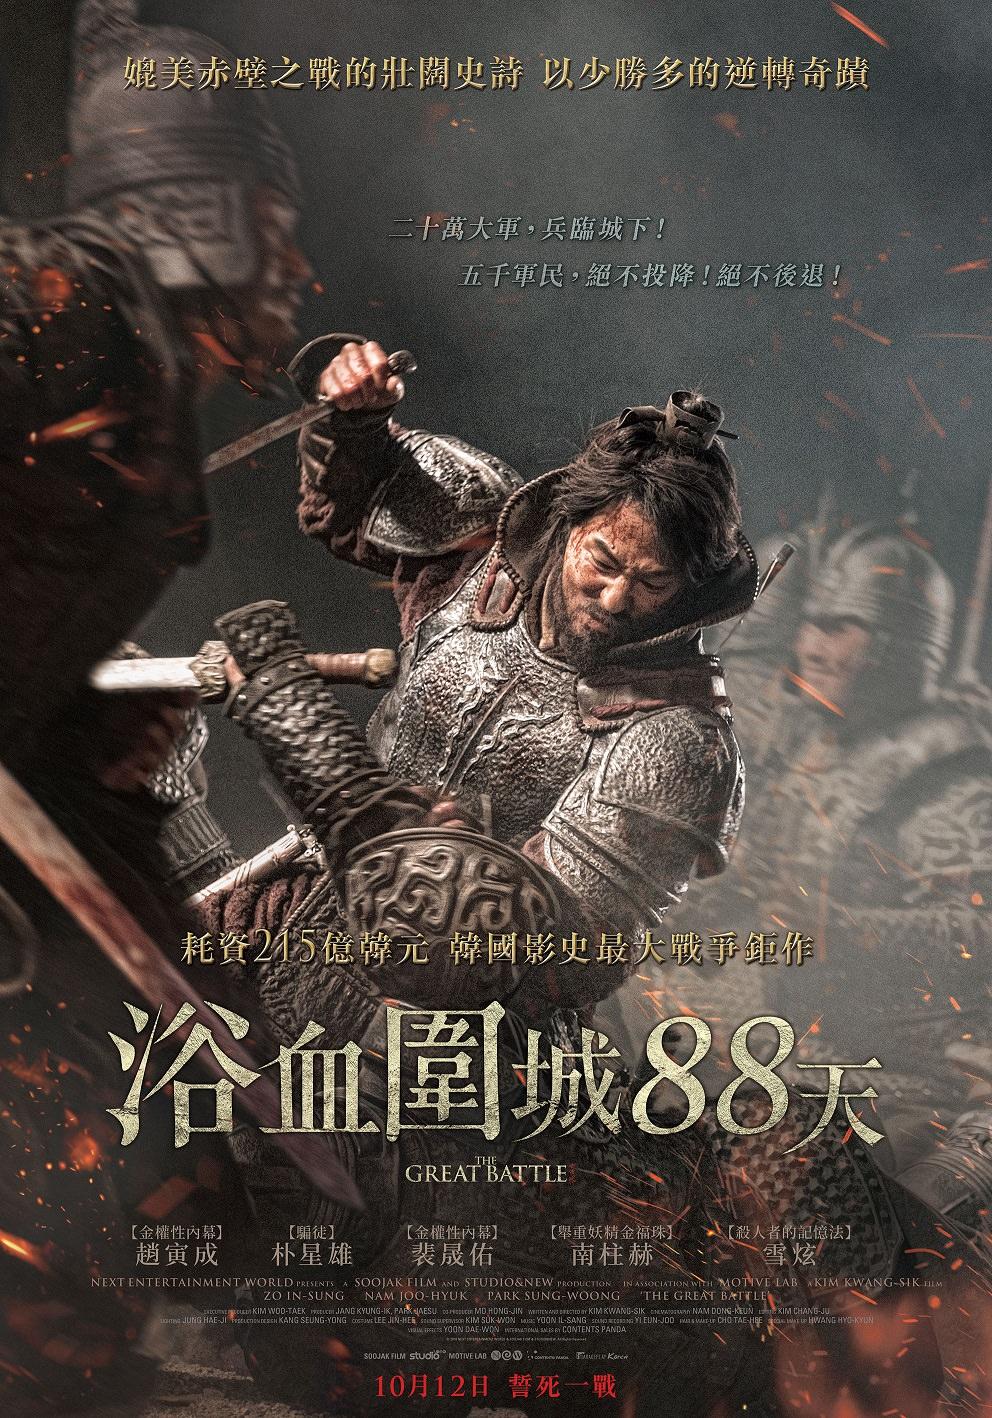 Movie, 안시성(韓國, 2018) / 浴血圍城88天(台灣) / 安市城(香港) / The Great Battle(英文), 電影海報, 台灣